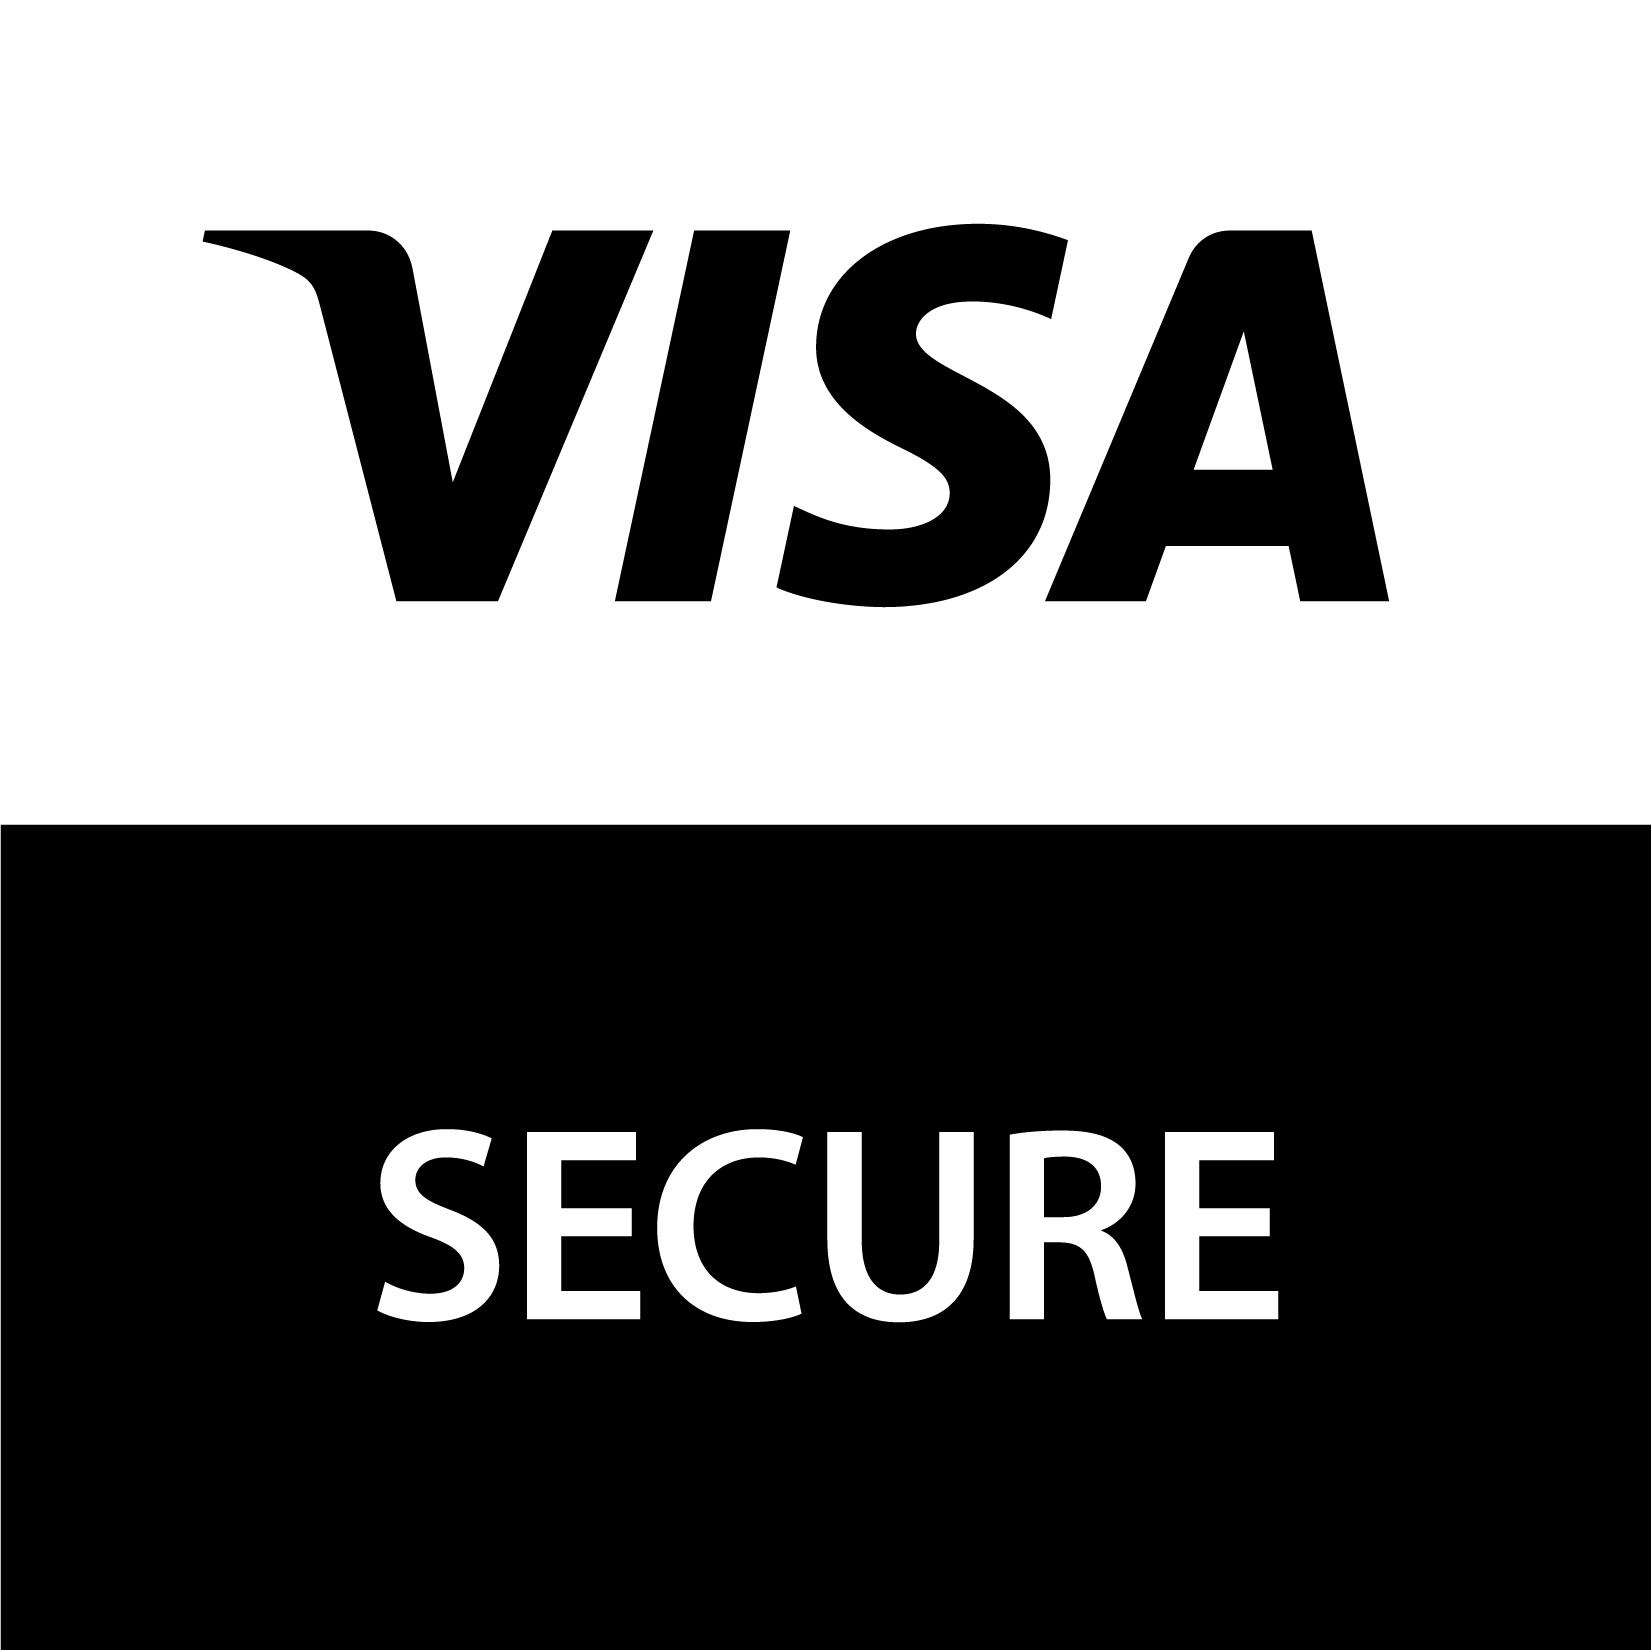 visa-secure-blk